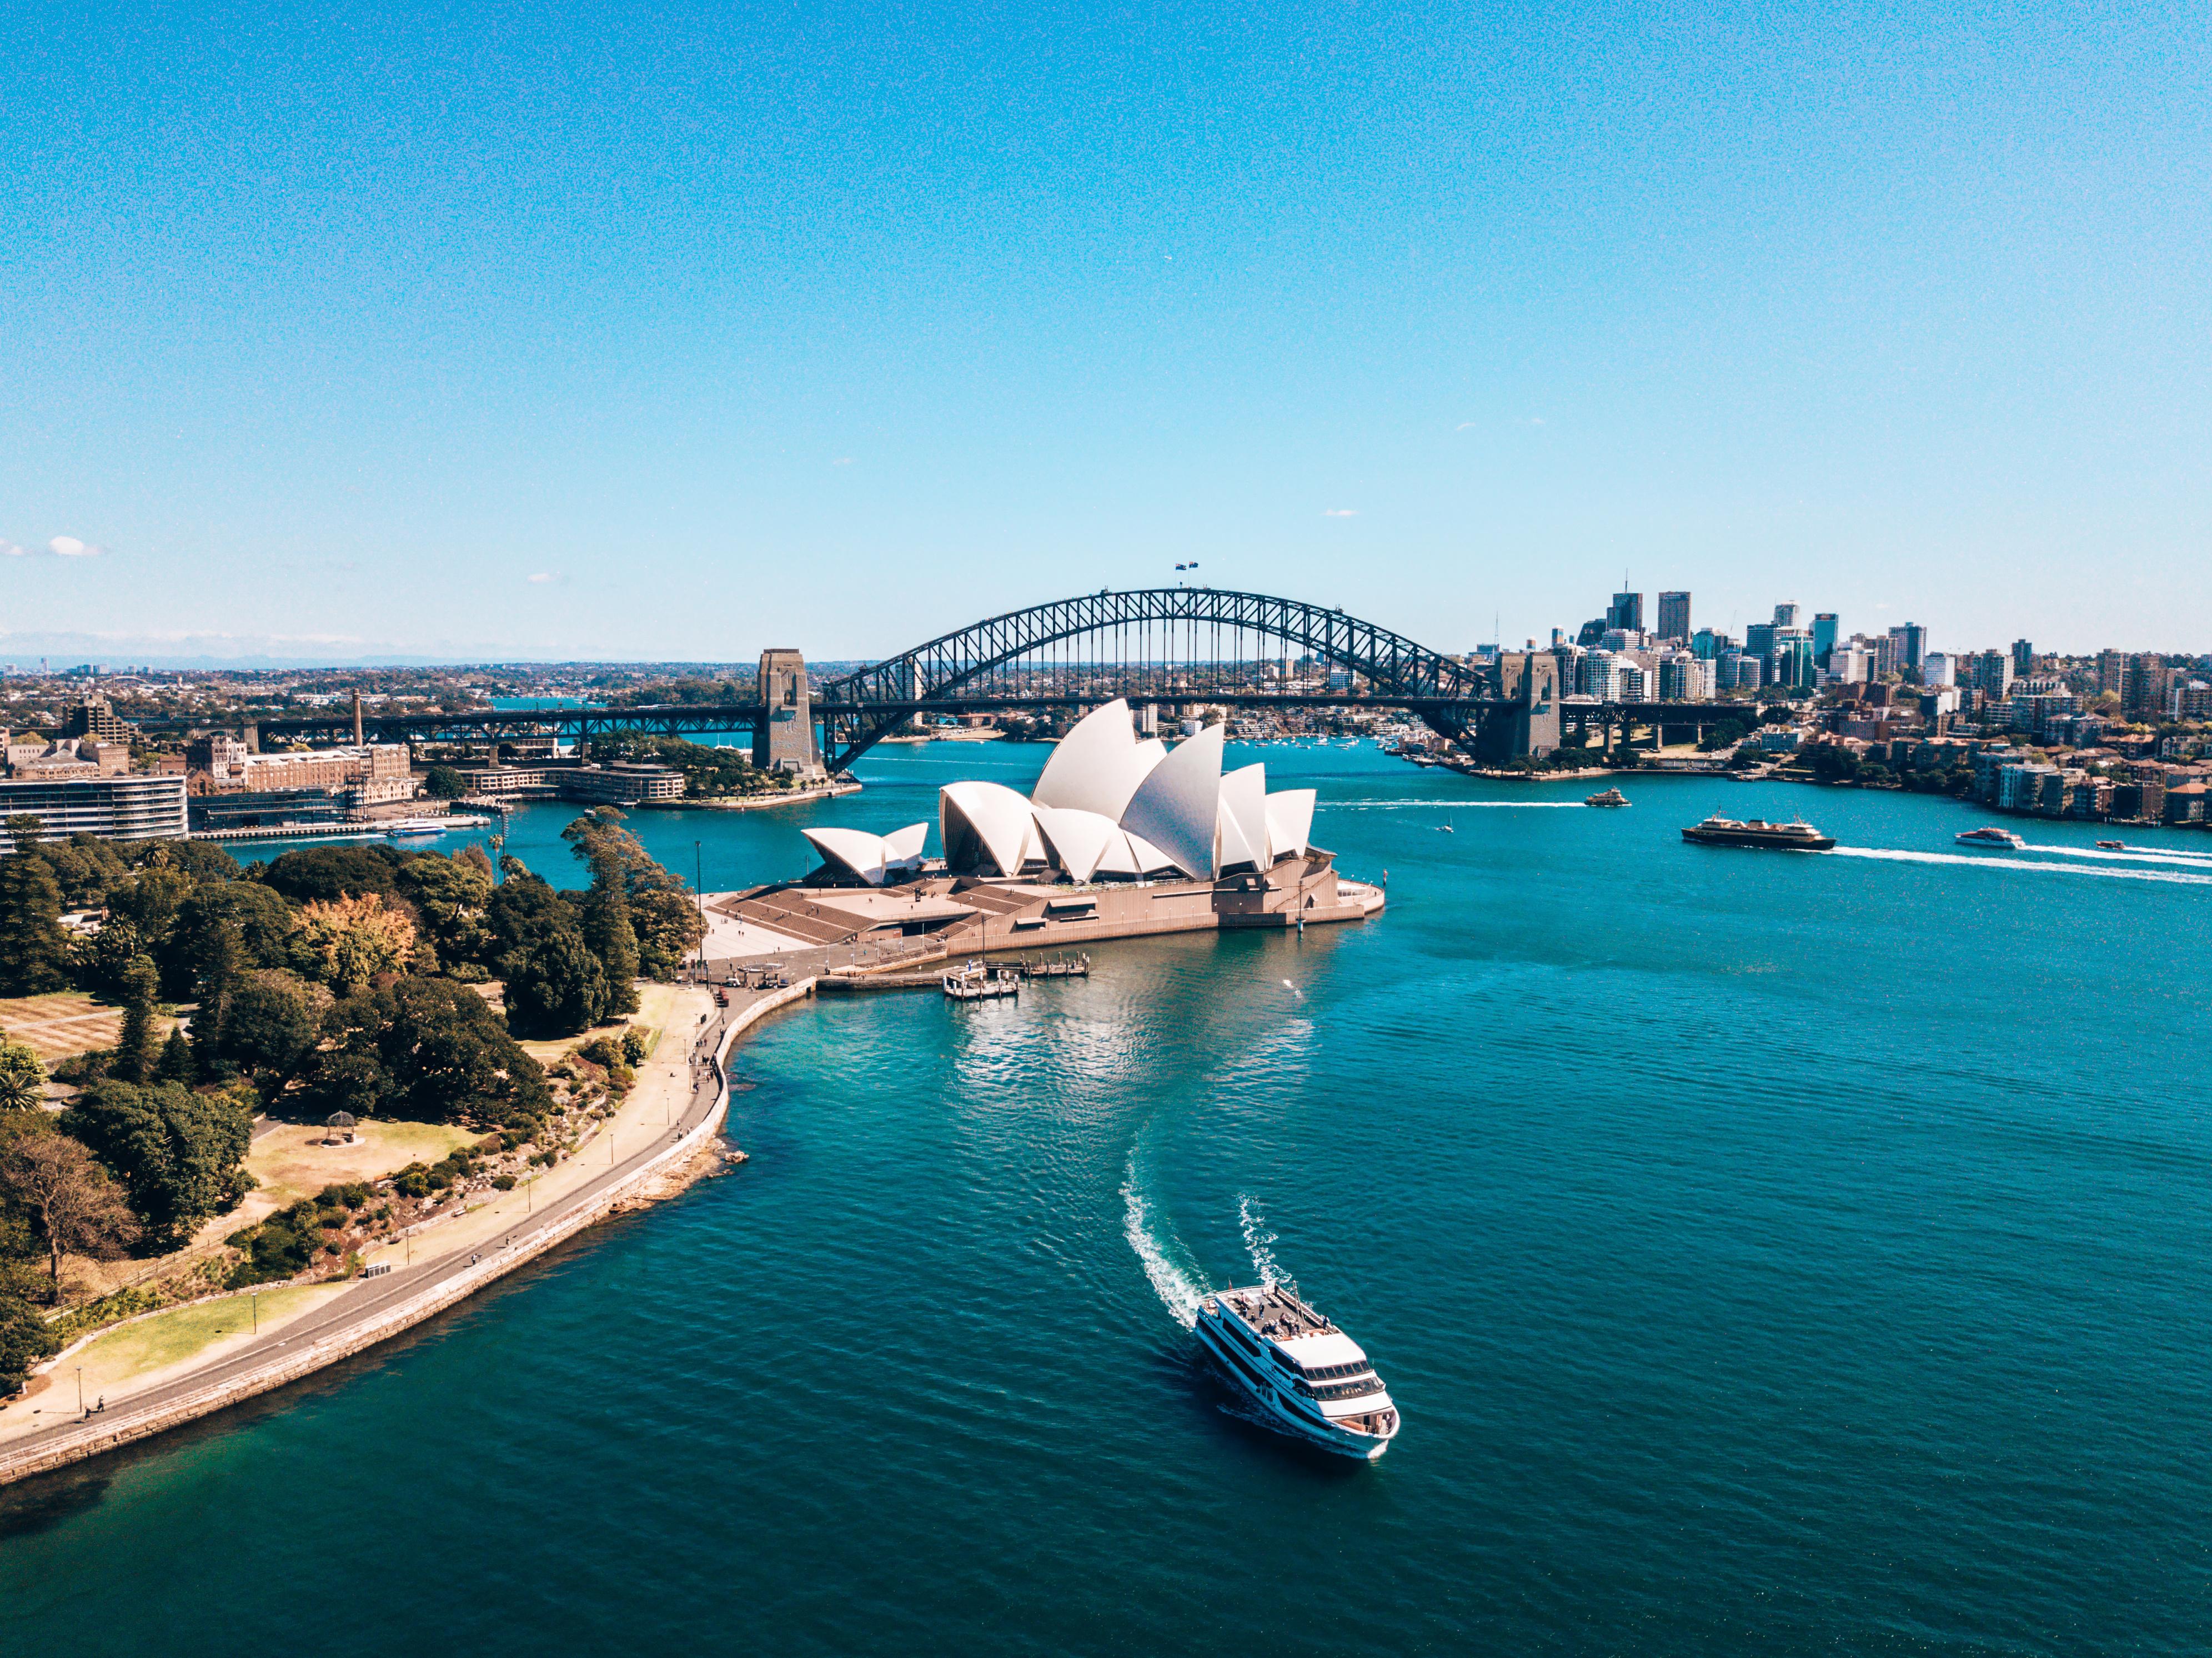 NSW 190 visa changes